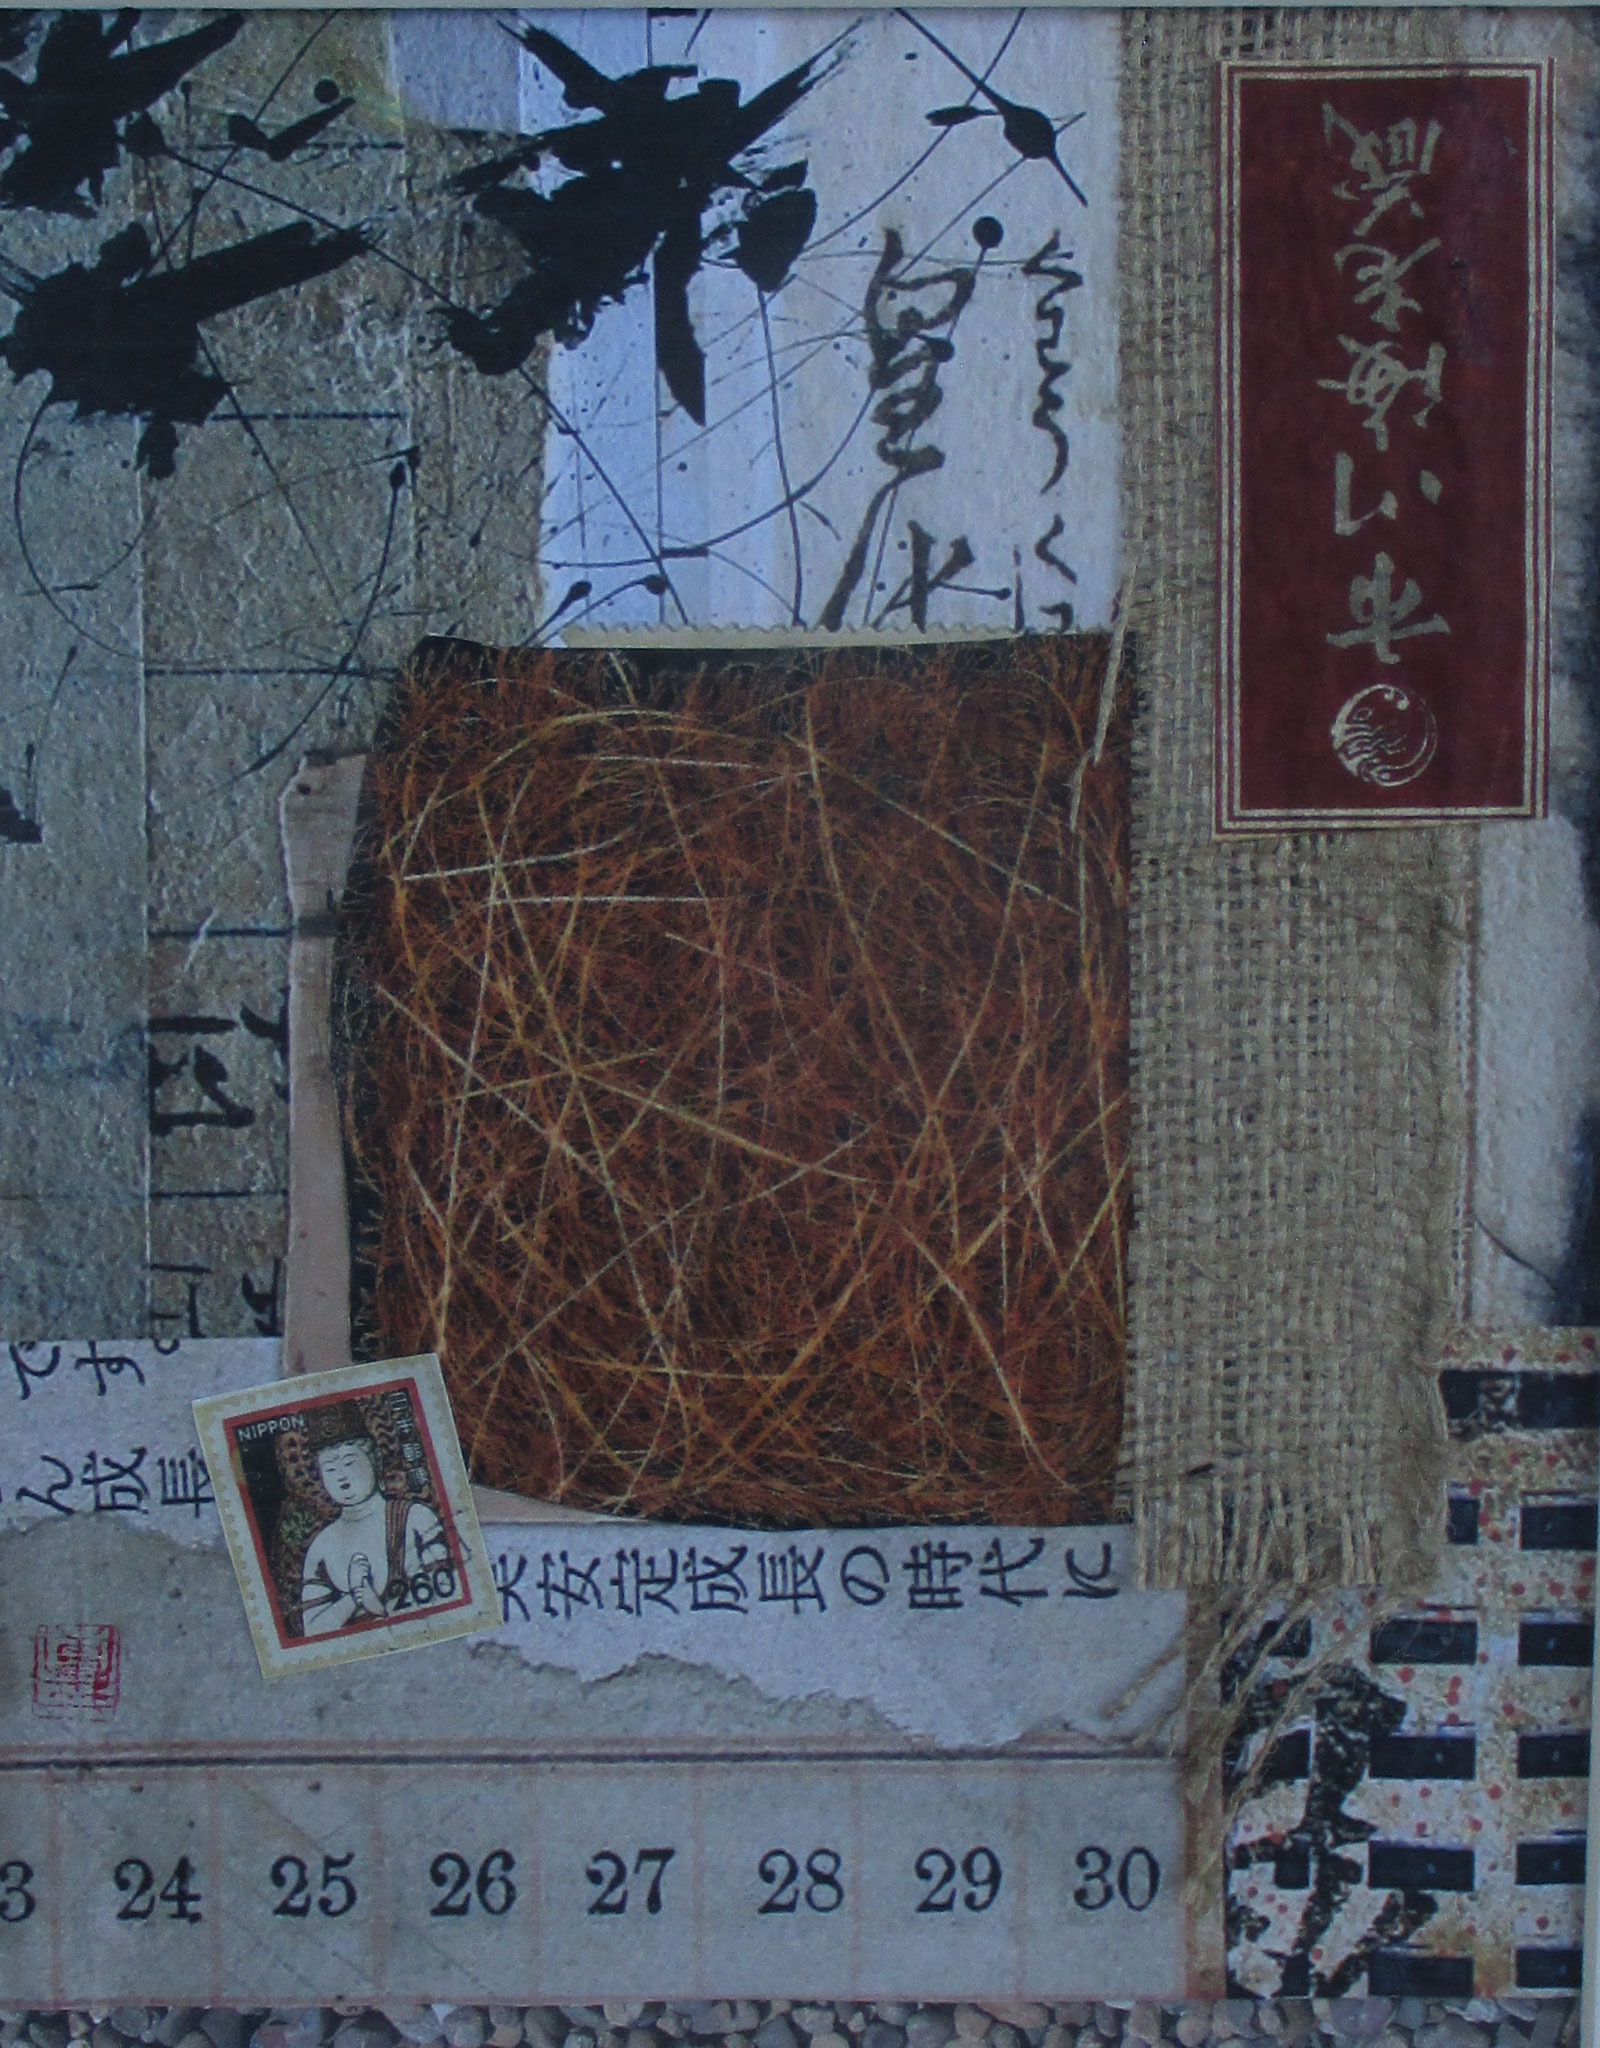 Awakened  目覚め Mezame Collage, Washi paper, burlap, ink 11 x 14, 2018